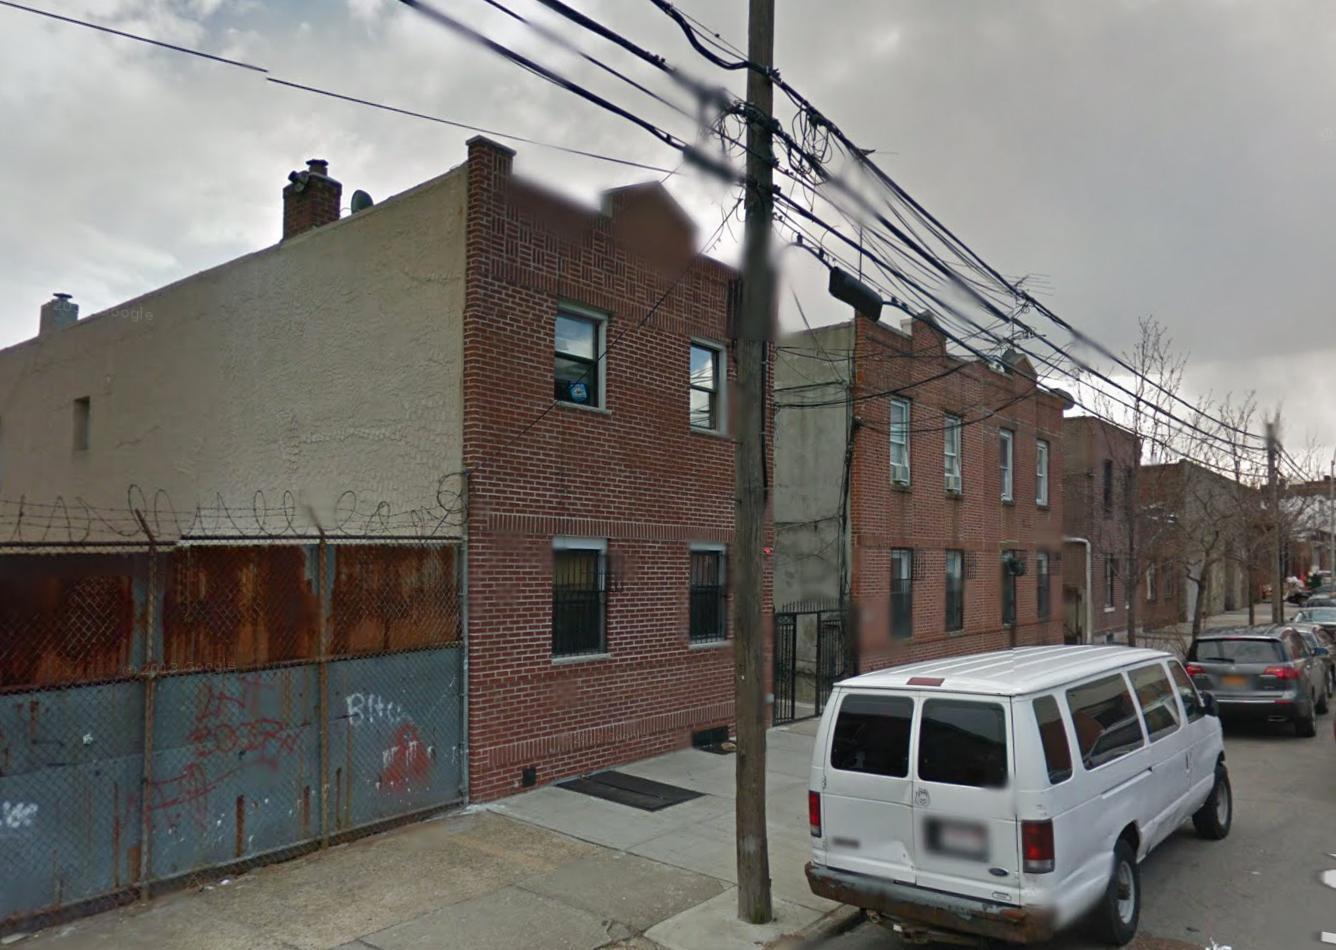 38-15 9th Street